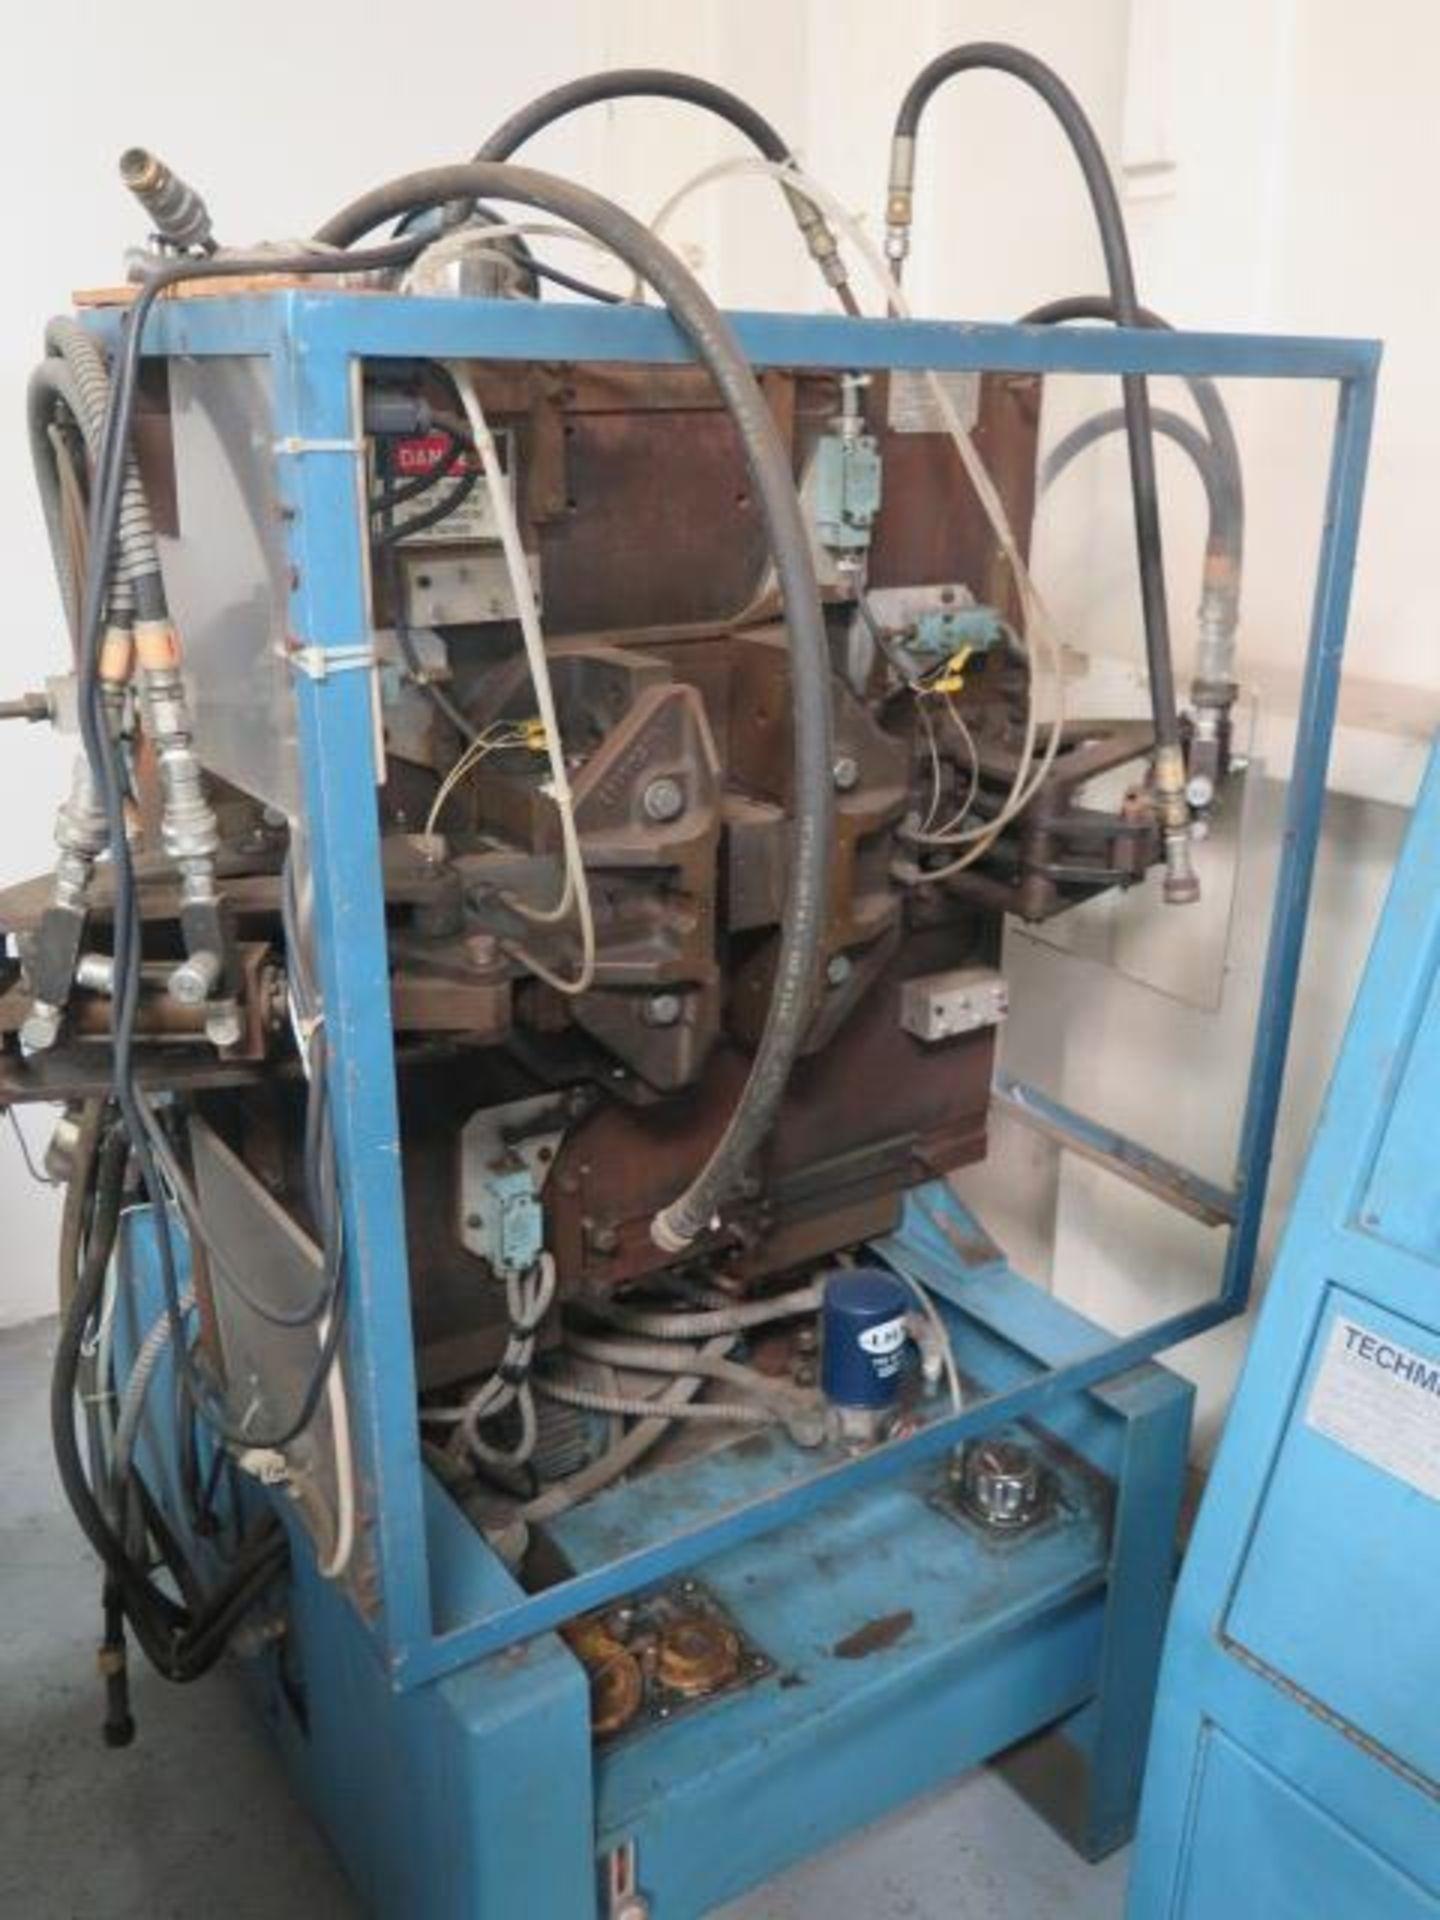 Lot 136 - Techmire CEM-01 Injection Molding Machine s/n 841-098 w/ Techmire Controls, Air Ejector, SOLD AS IS